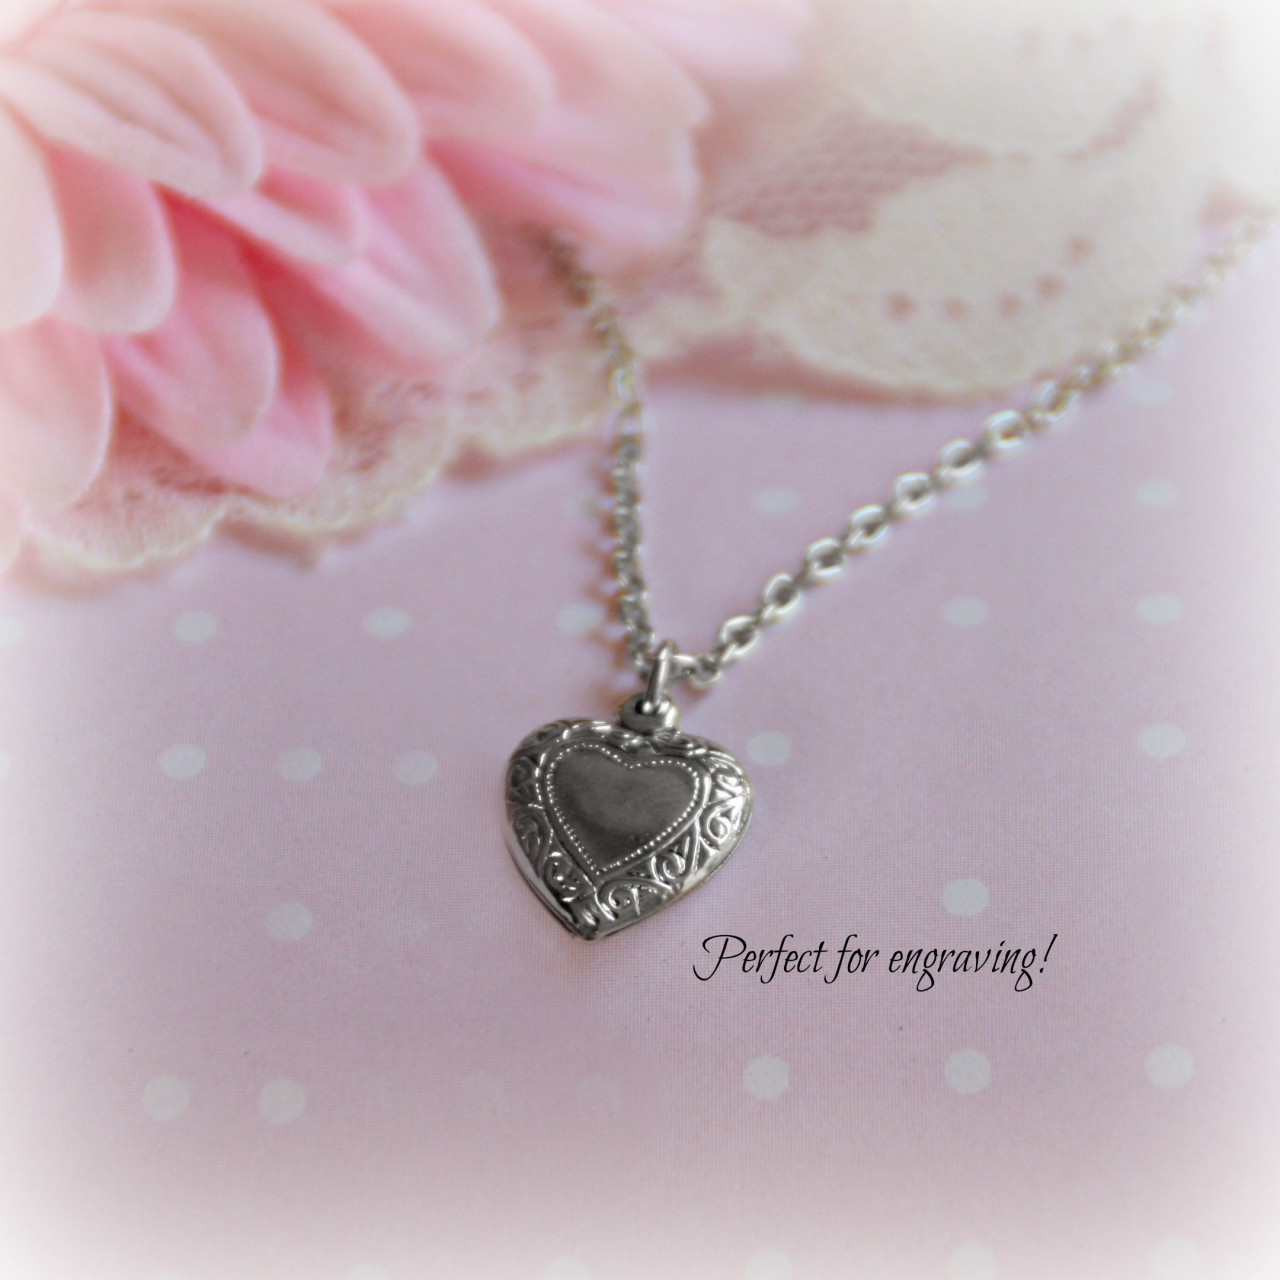 RH-37  Puffed Heart Rhodium Engravable Necklace